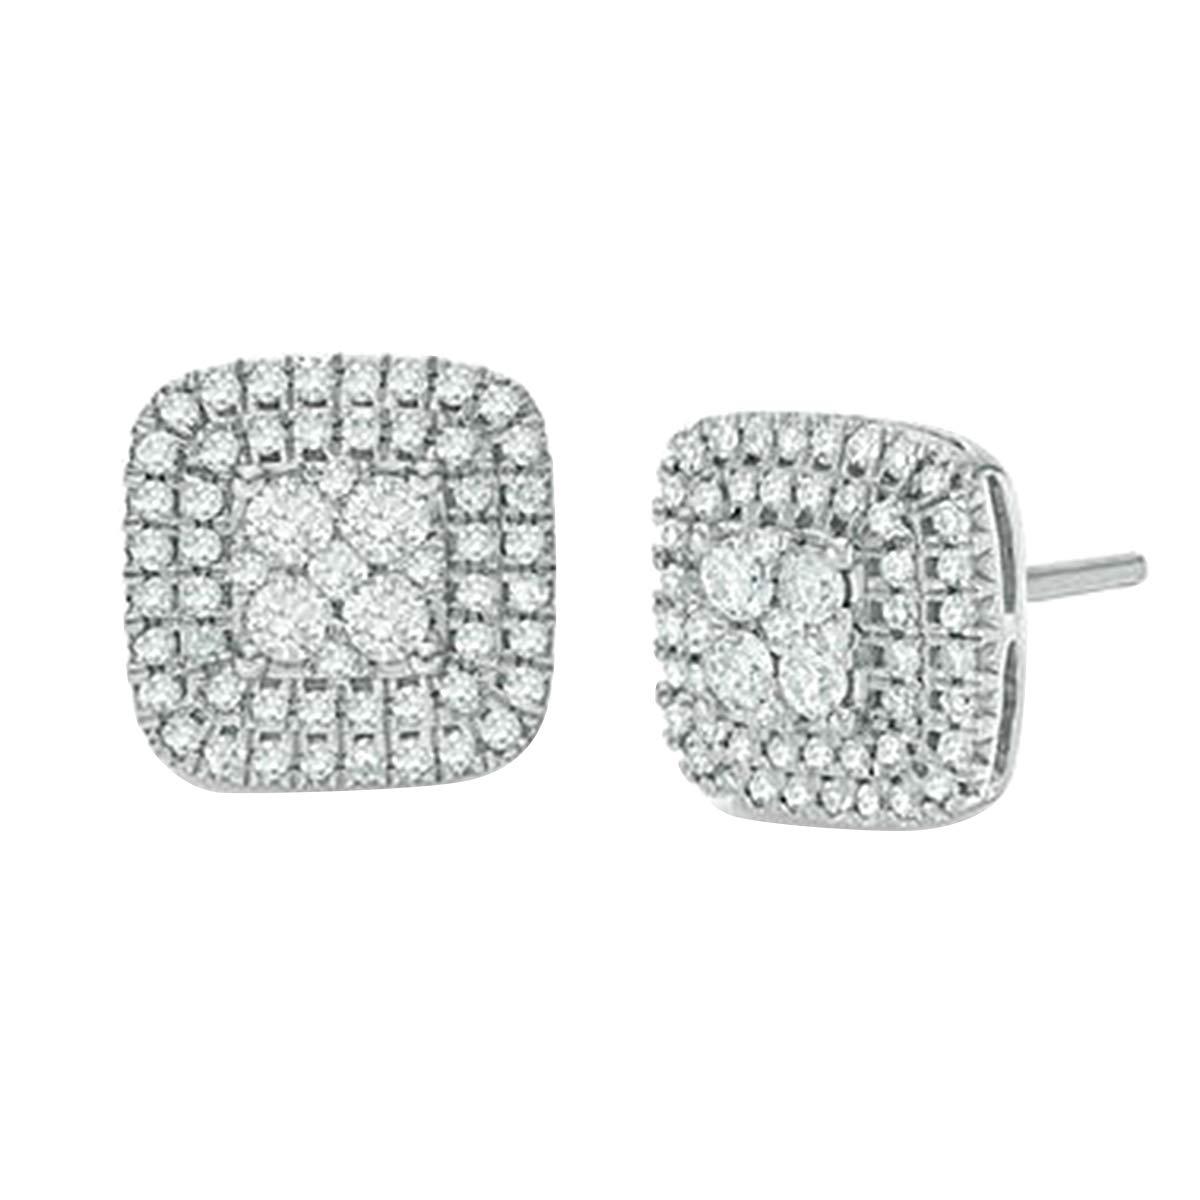 14K White Gold 0.50 Ct Round Cut Simulated Diamond Cushion Stud Earrings